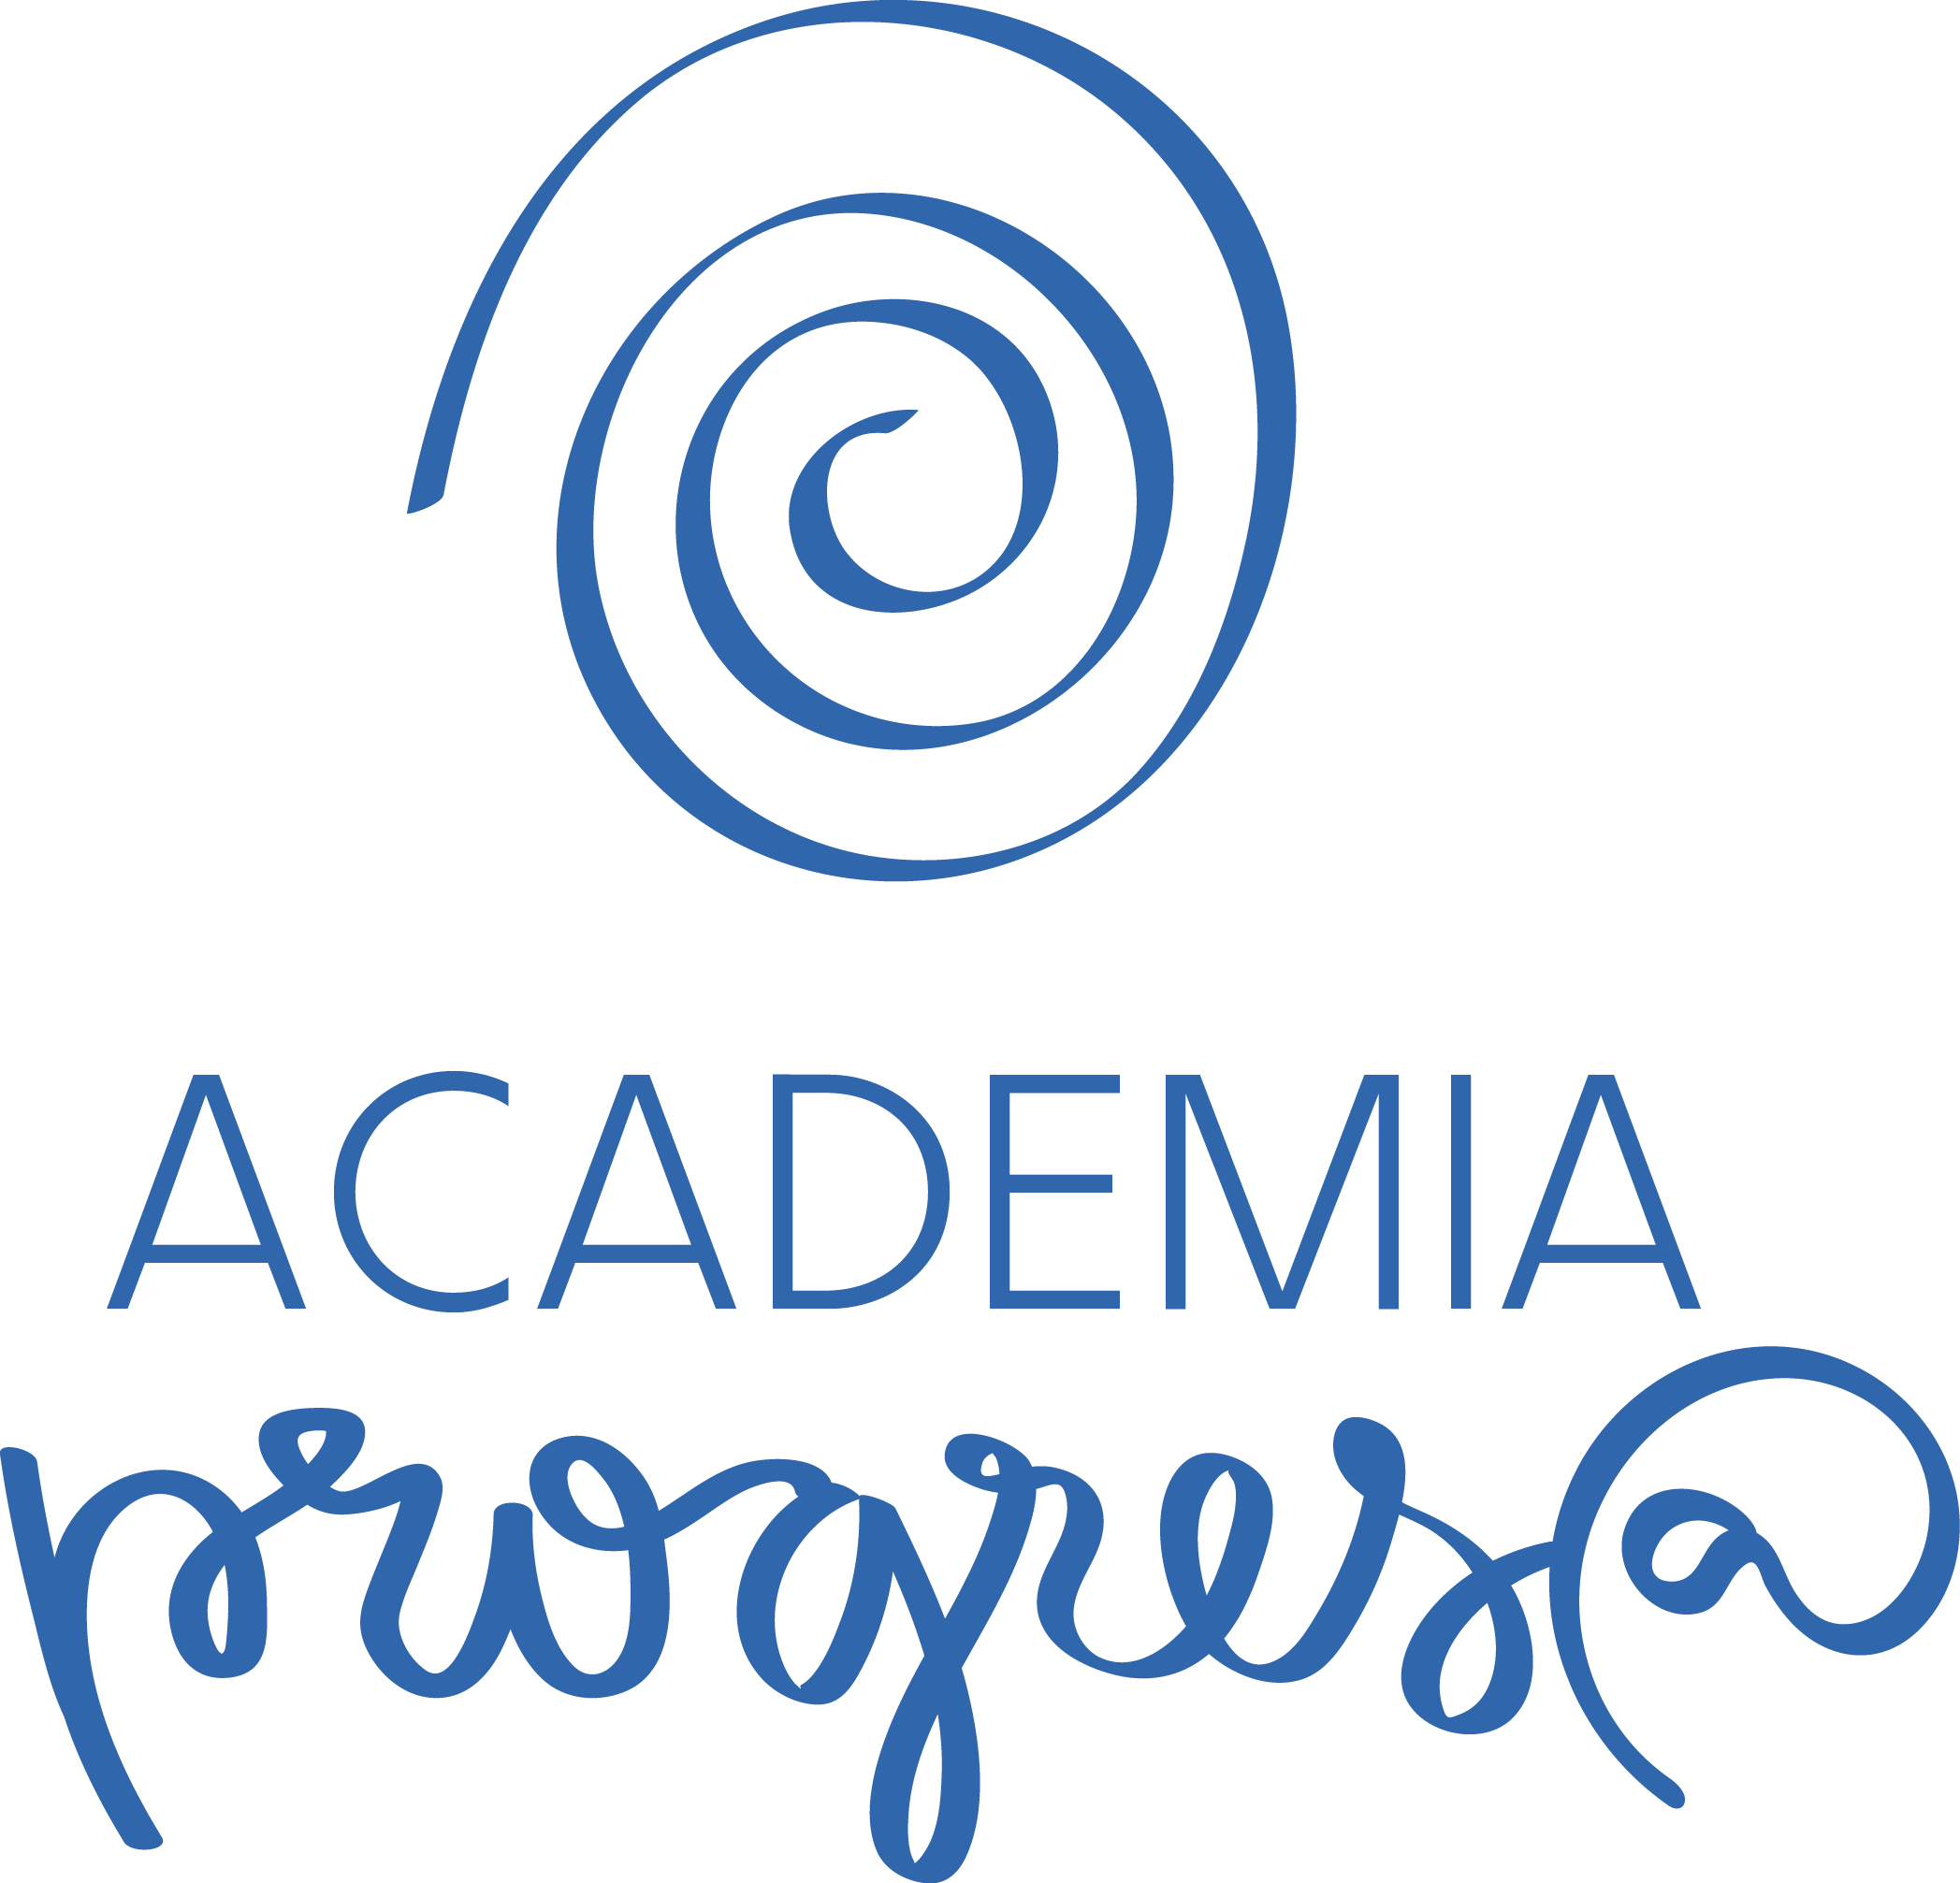 Academia progresa